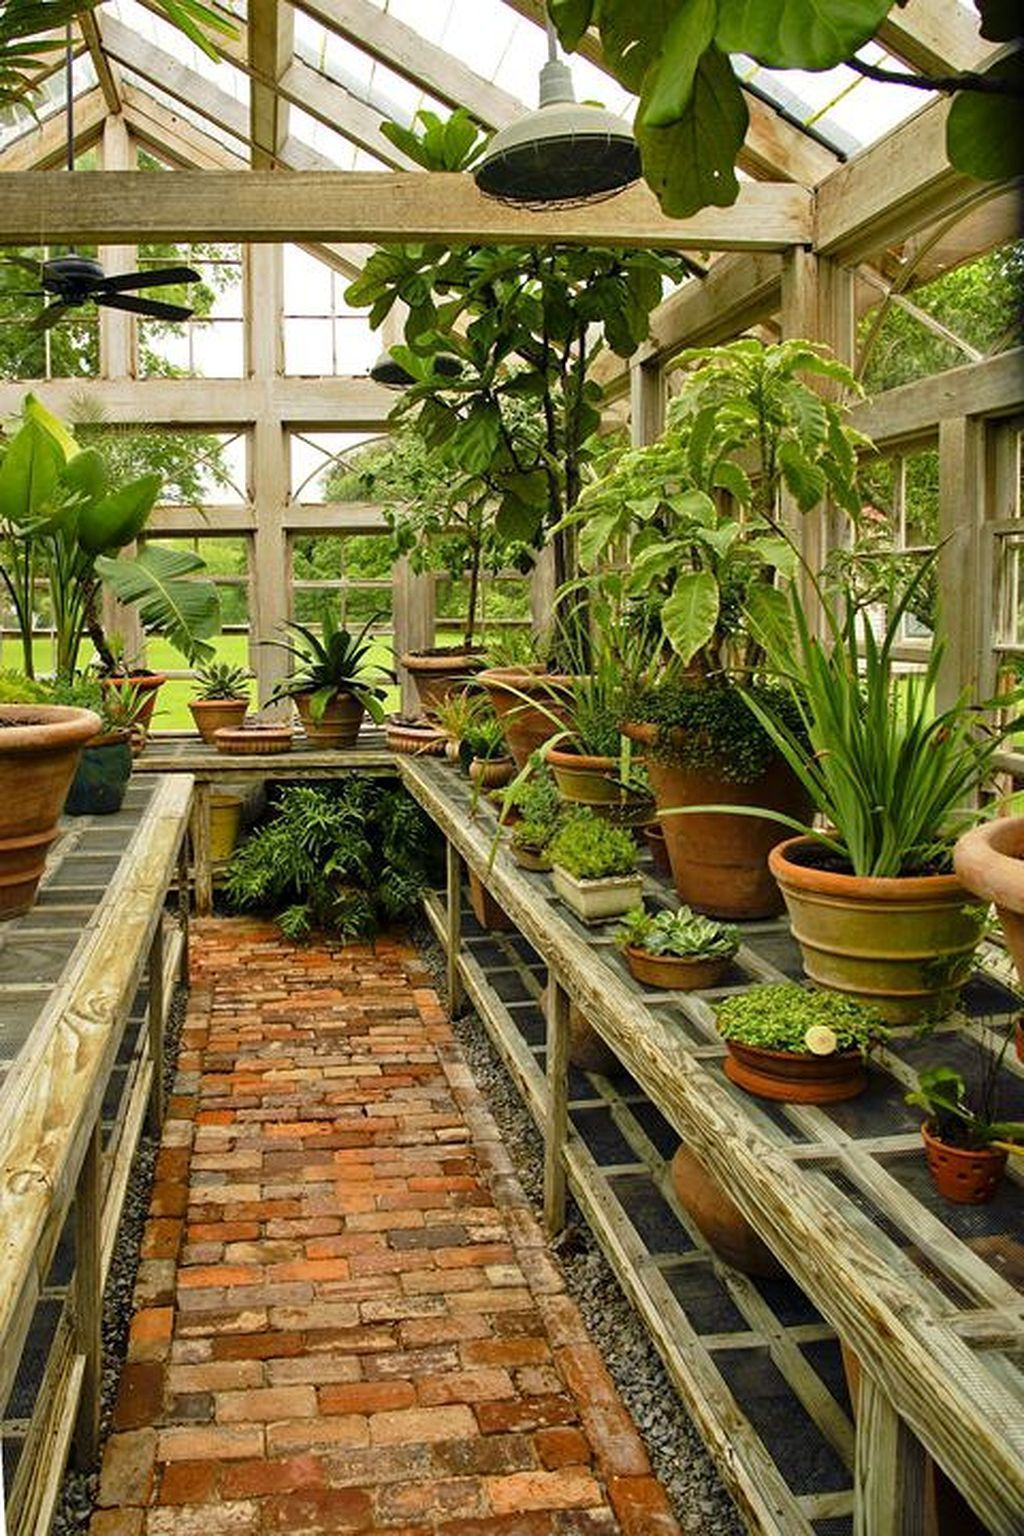 Greenhouse Gardening For Beginners Ideas 7 Greenhousefarm Jardins Jardinage En Serre Jardin D Hiver